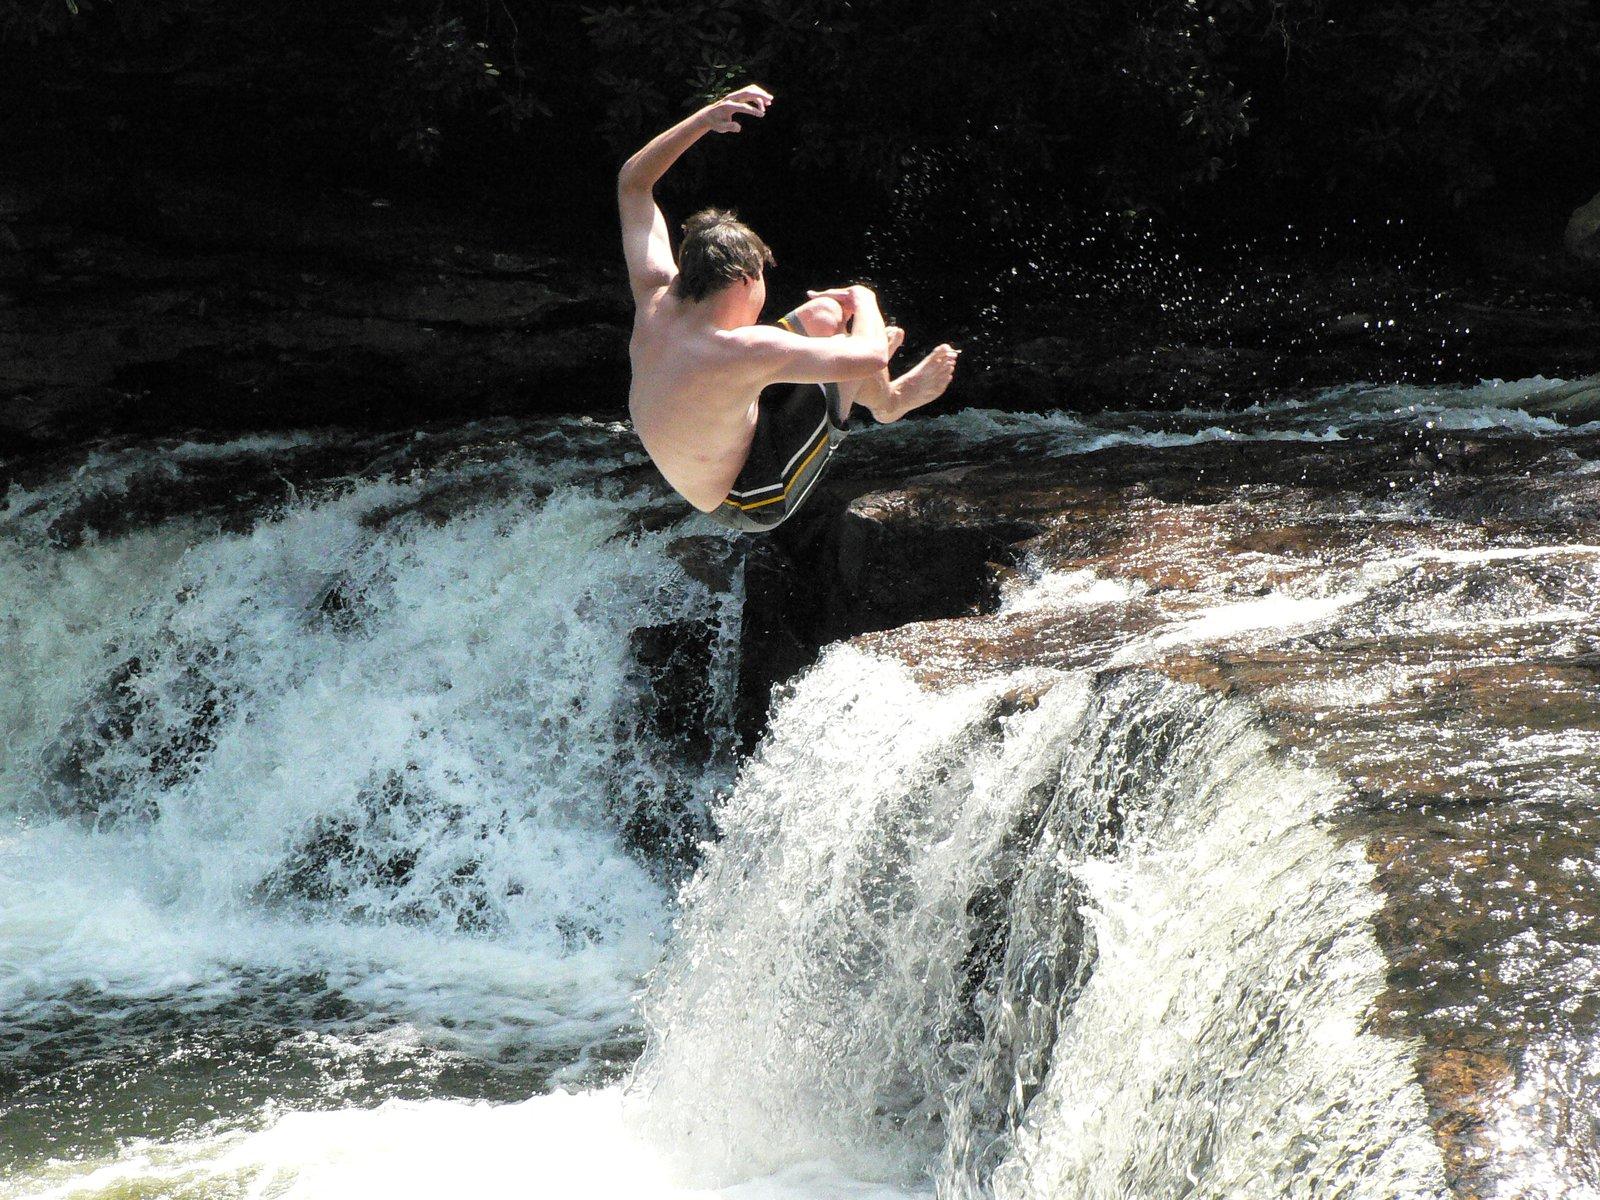 Cork 5 off a waterfall